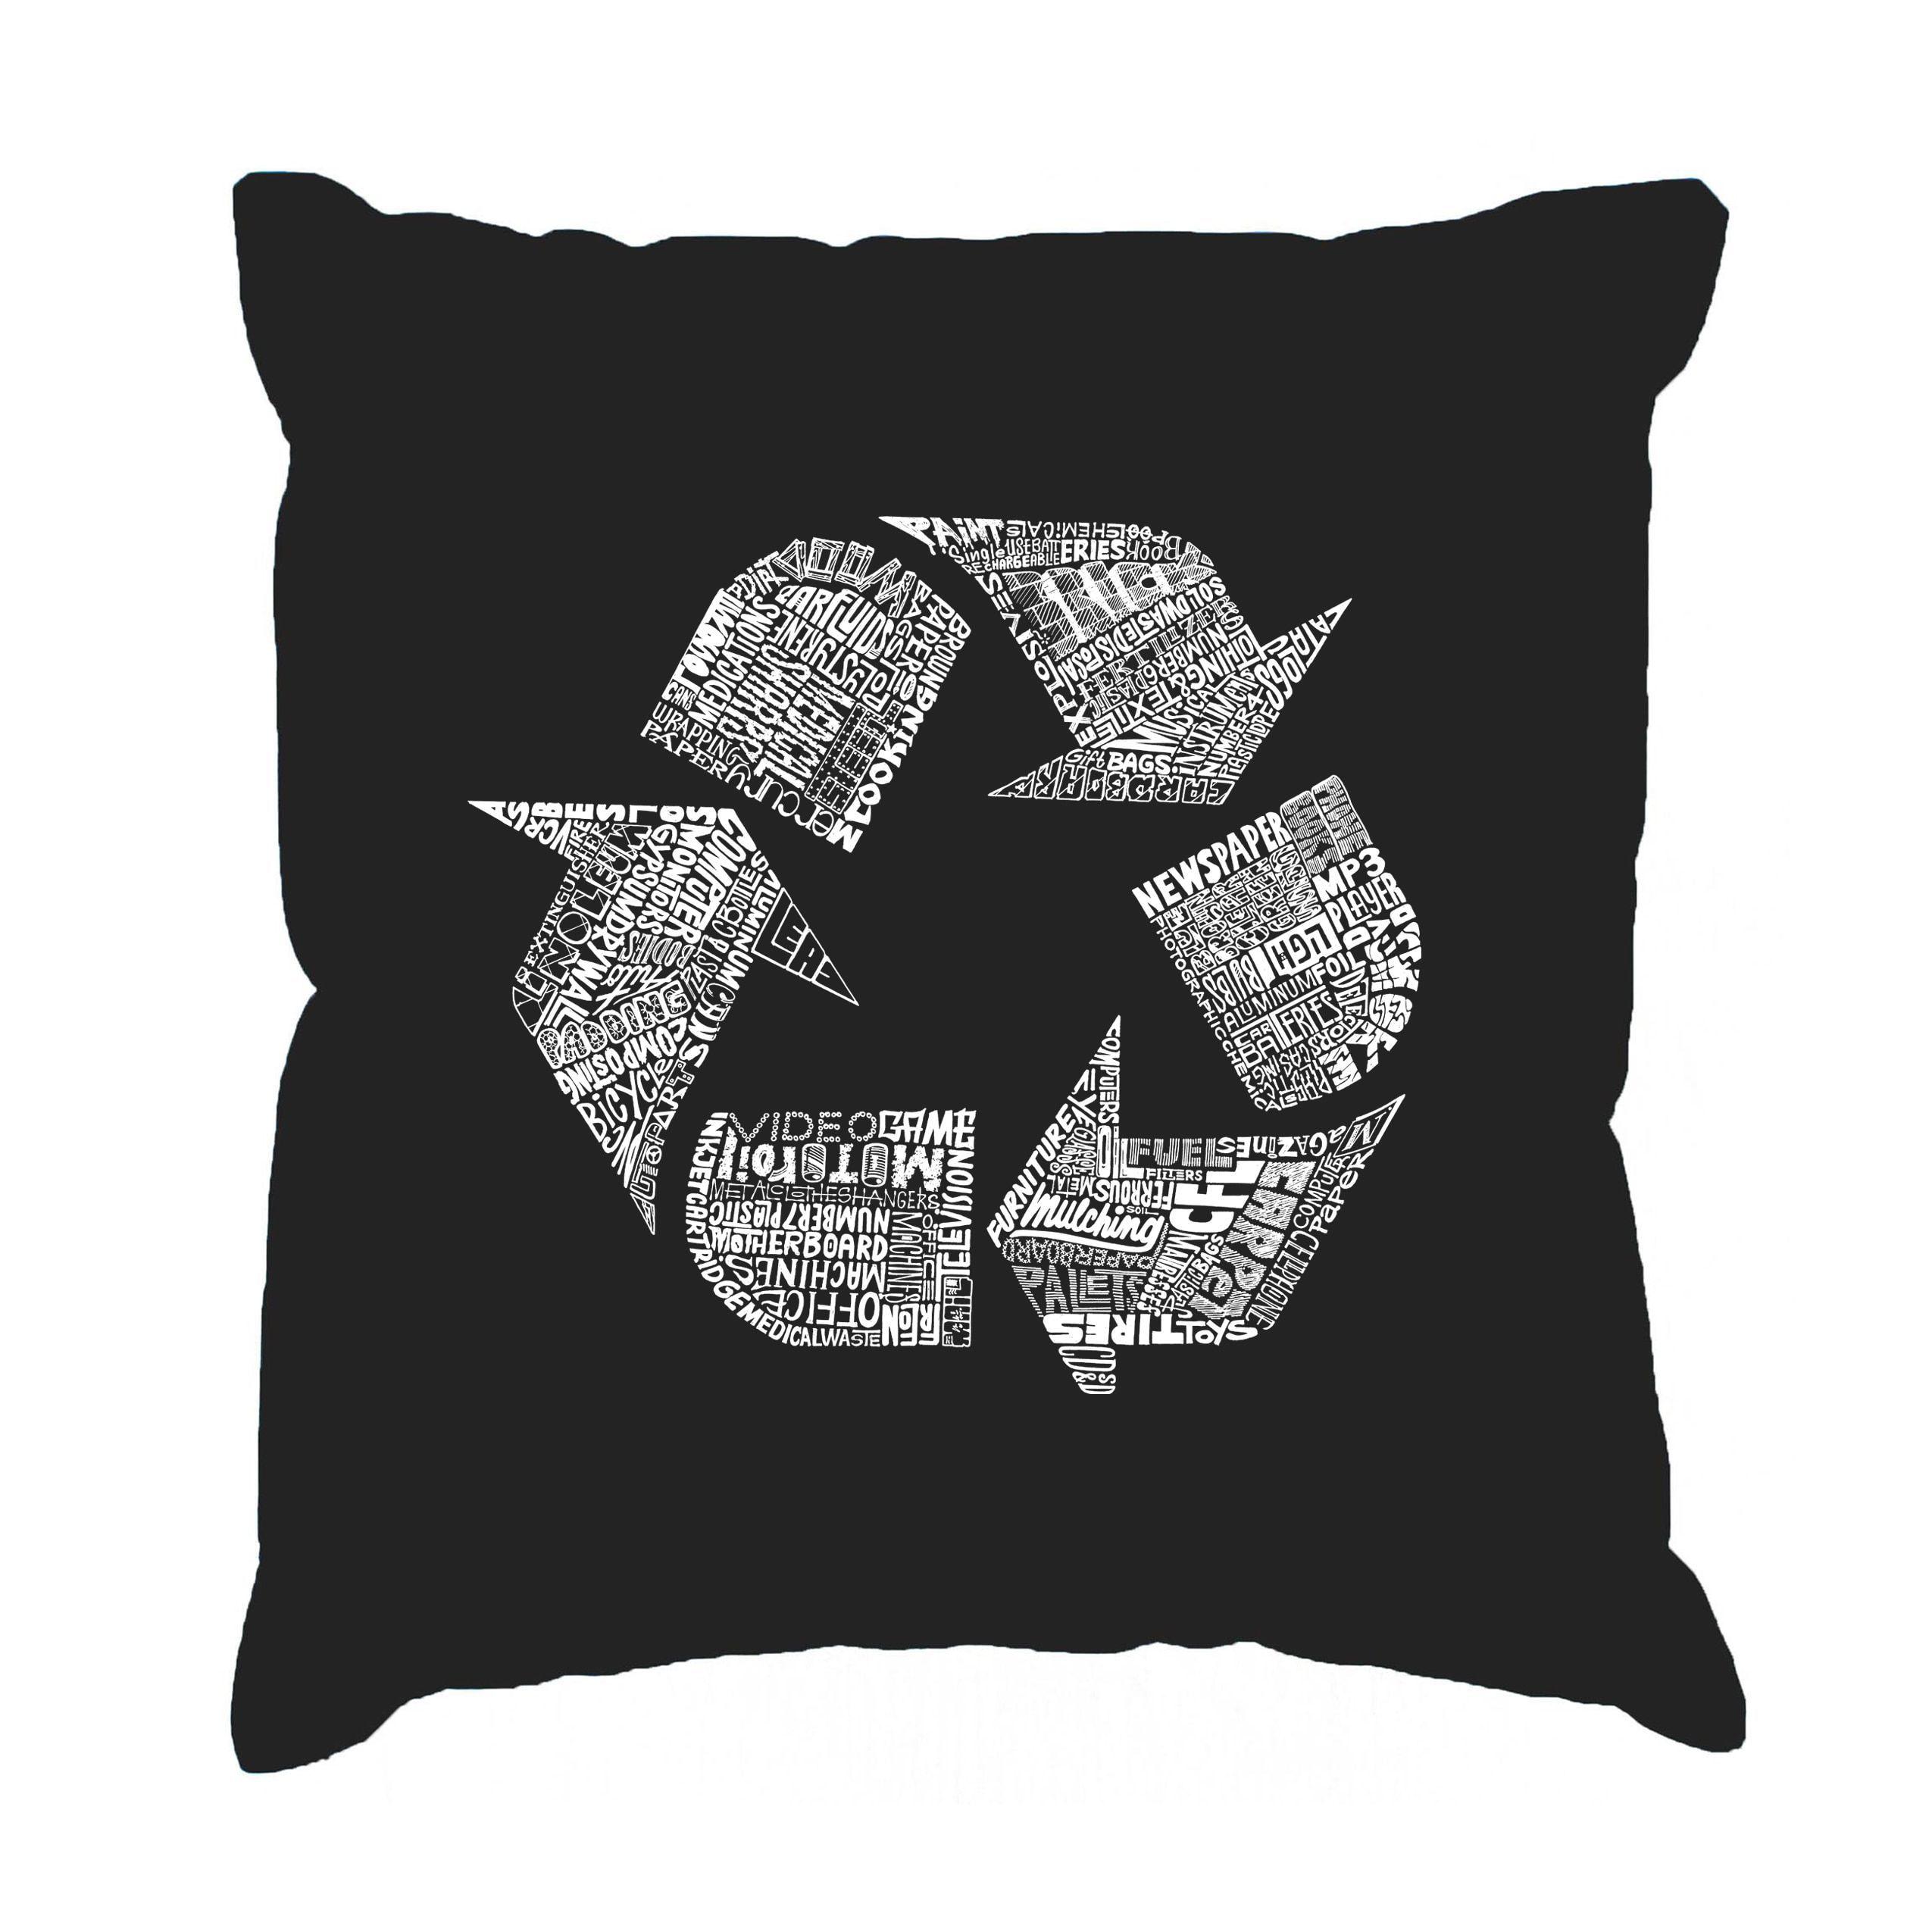 Black Cotton Throw Pillows : LA Pop Art 86 Recyclable Products Black Cotton 17-inch Throw Pillow Cover (Black), Size 17 x ...